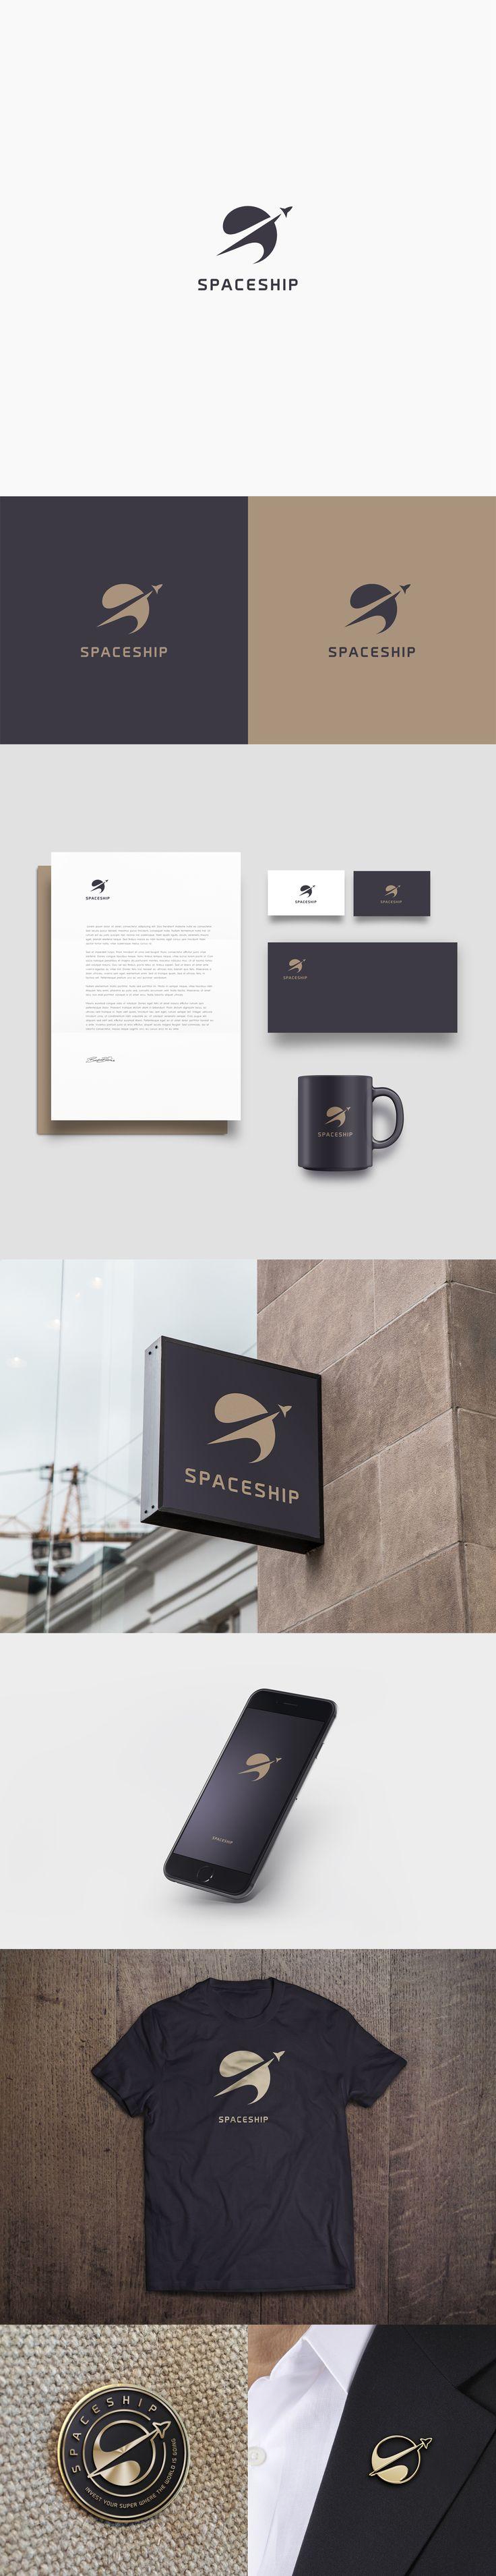 Spaceship | 99designs